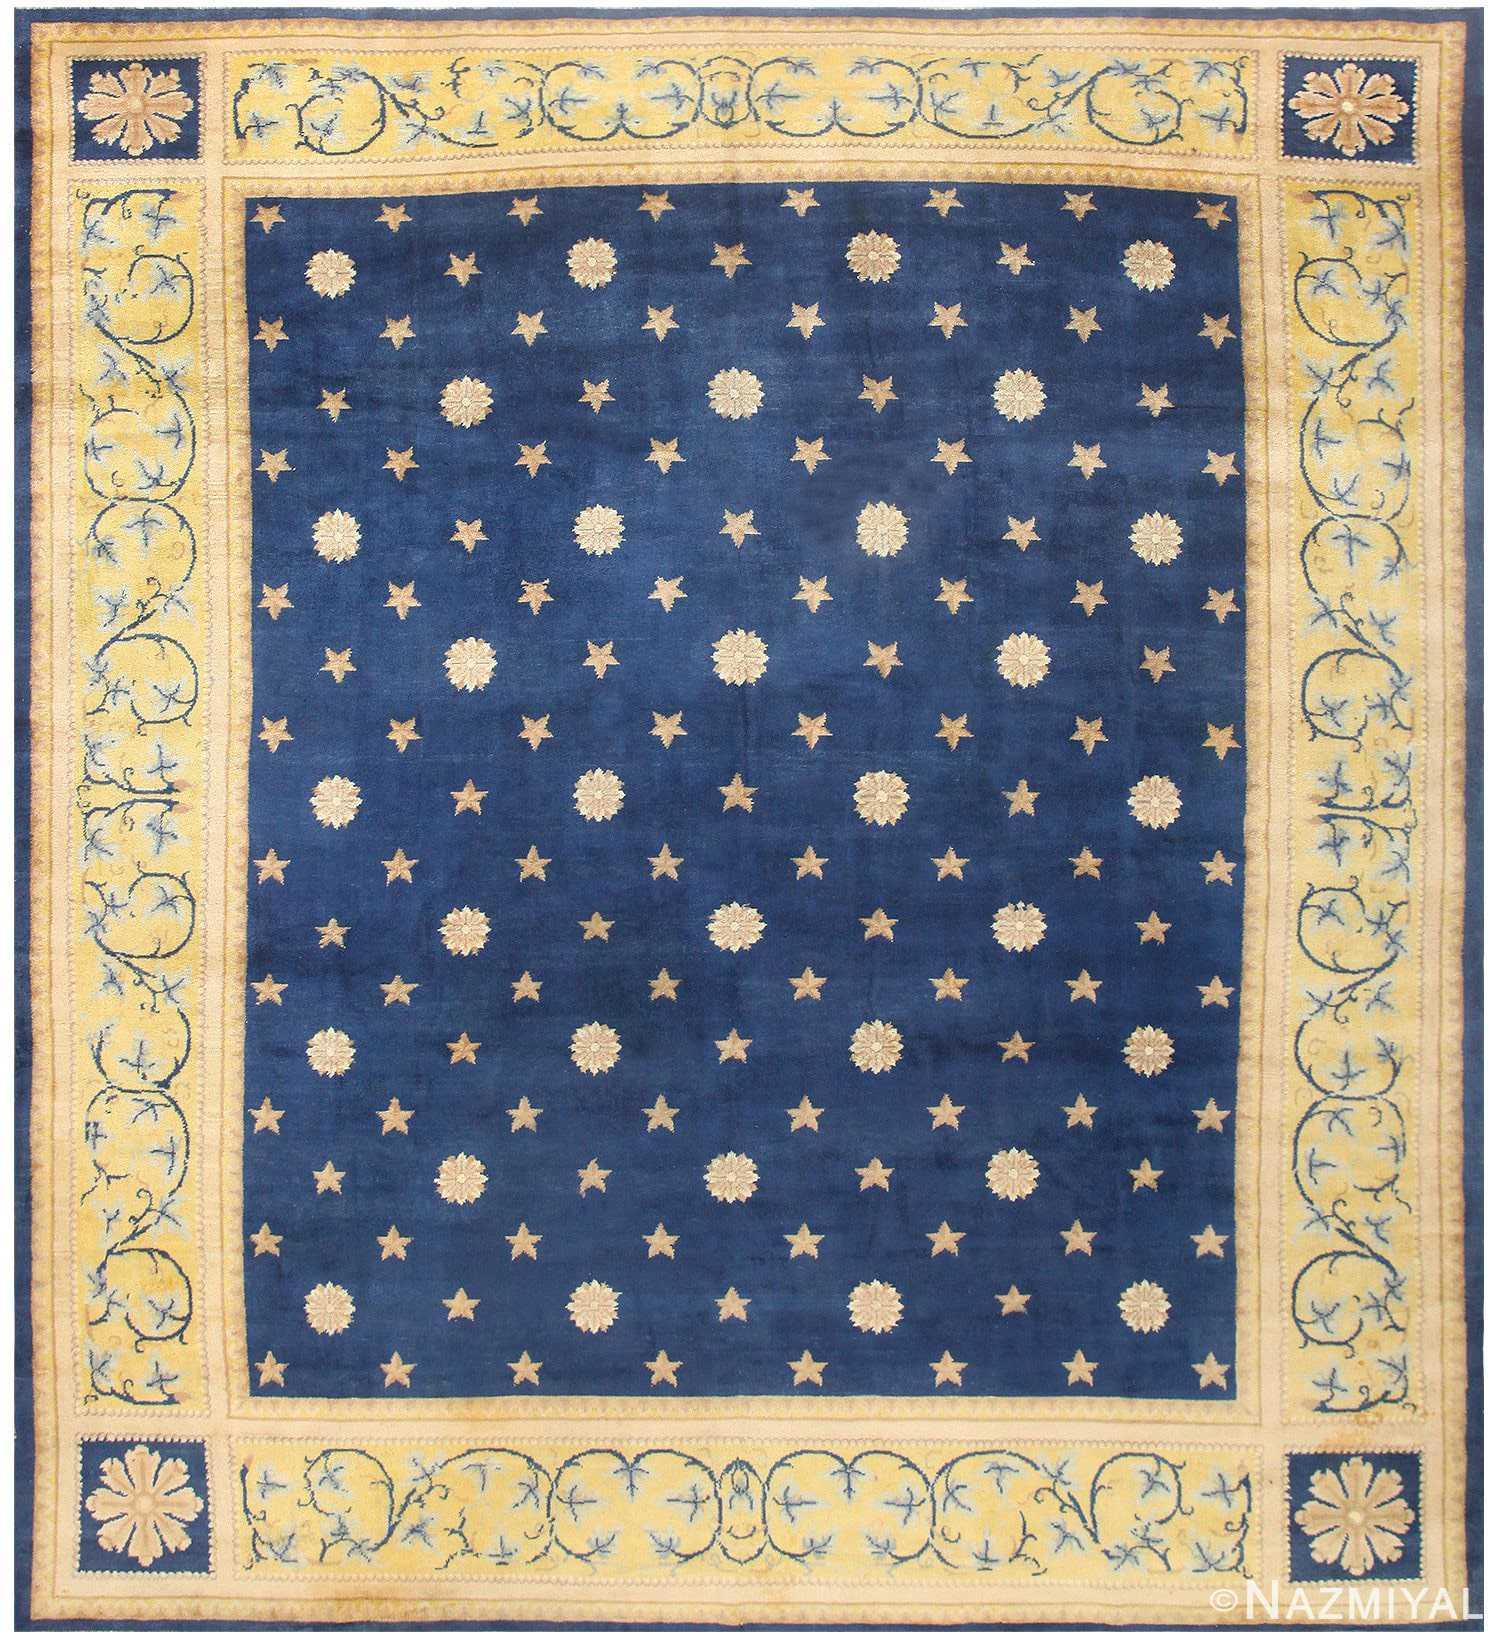 Antique Spanish Carpet with Celestial Design 48554 Nazmiyal